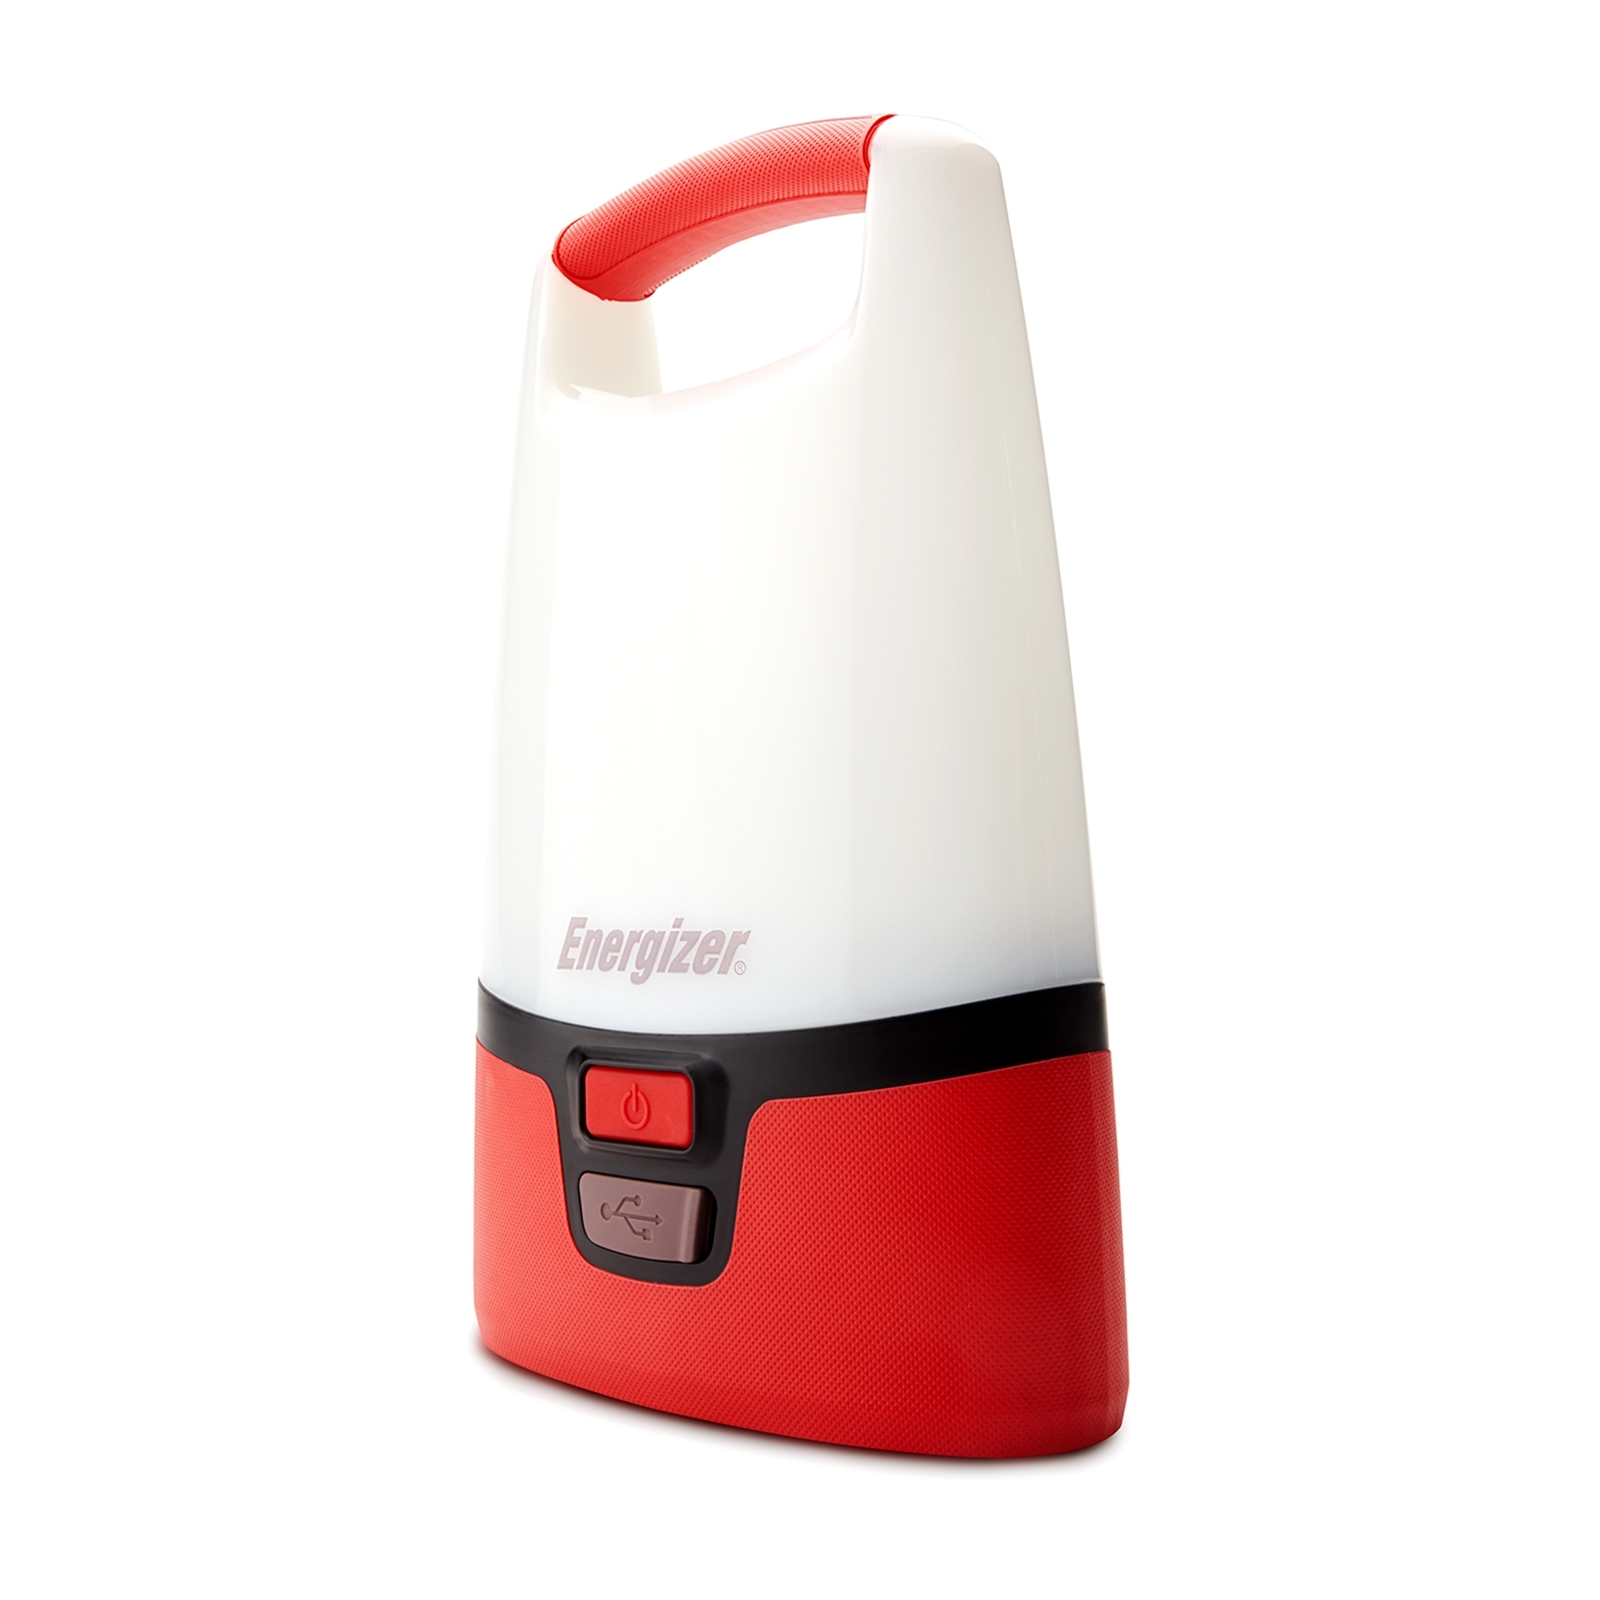 Energizer 1000 Lumen USB Area Lantern